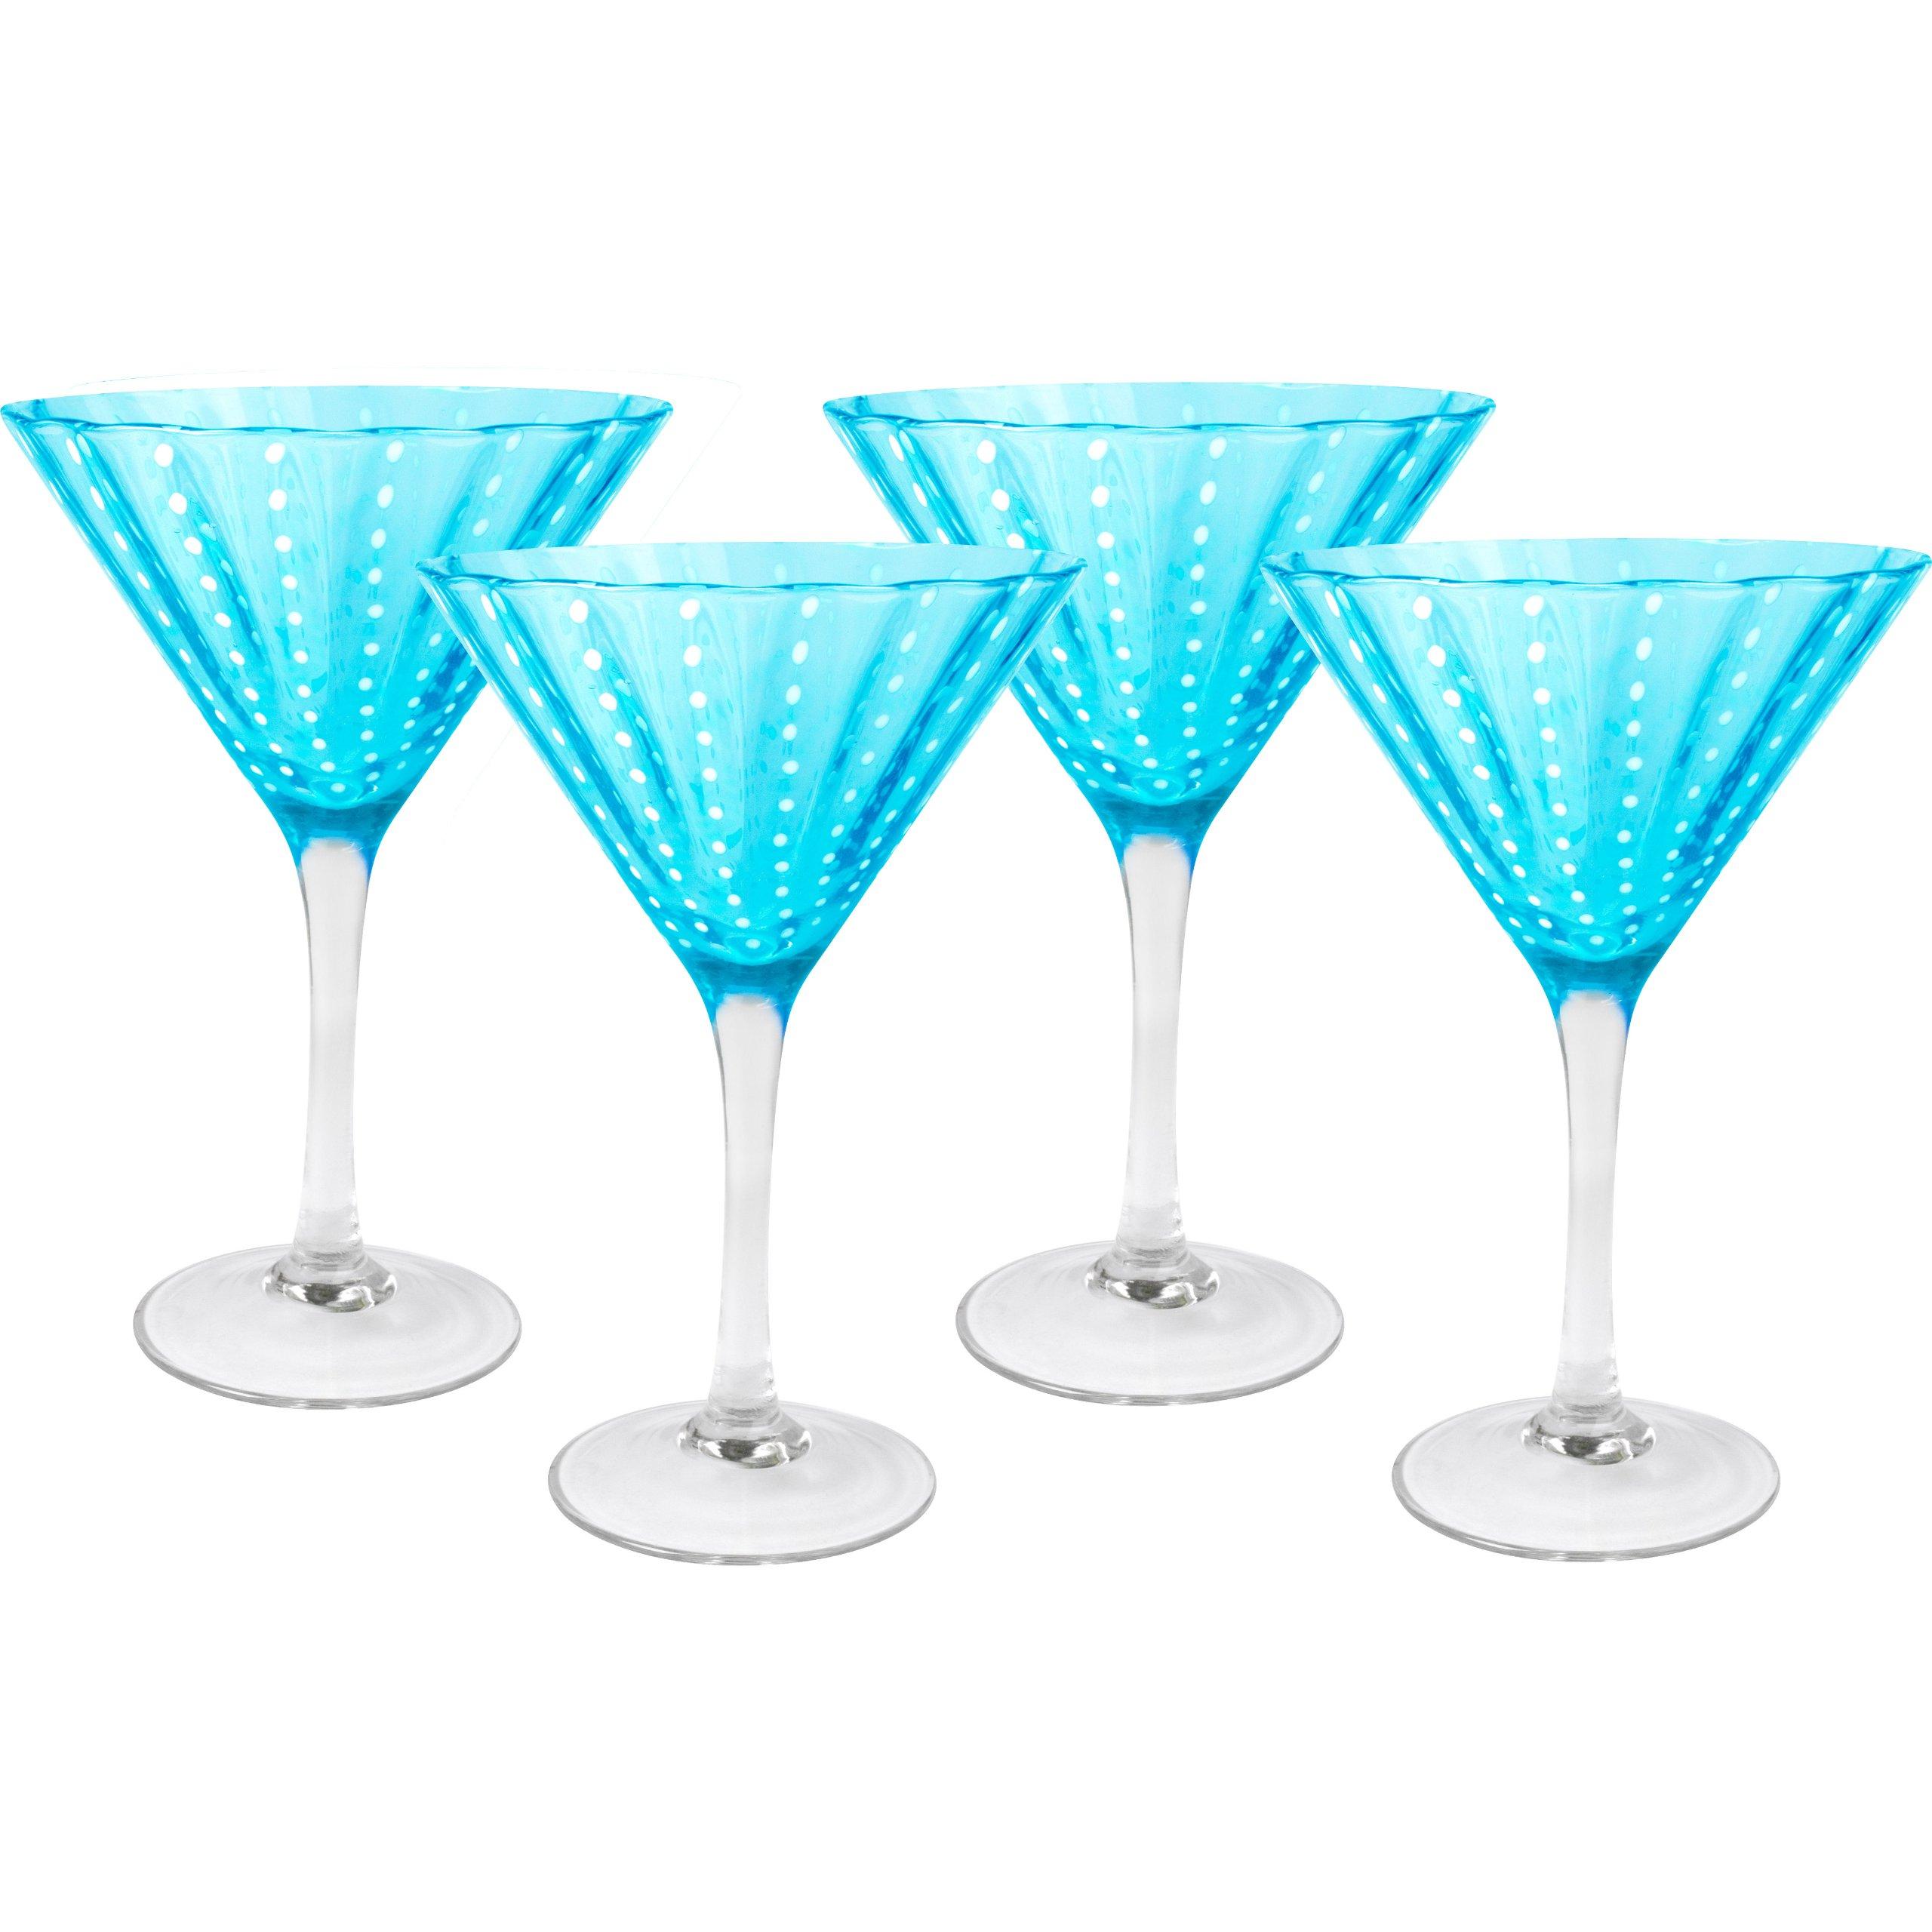 Artland Cambria 8 Ounce Turquoise Martini Bar Glass, Set of 4